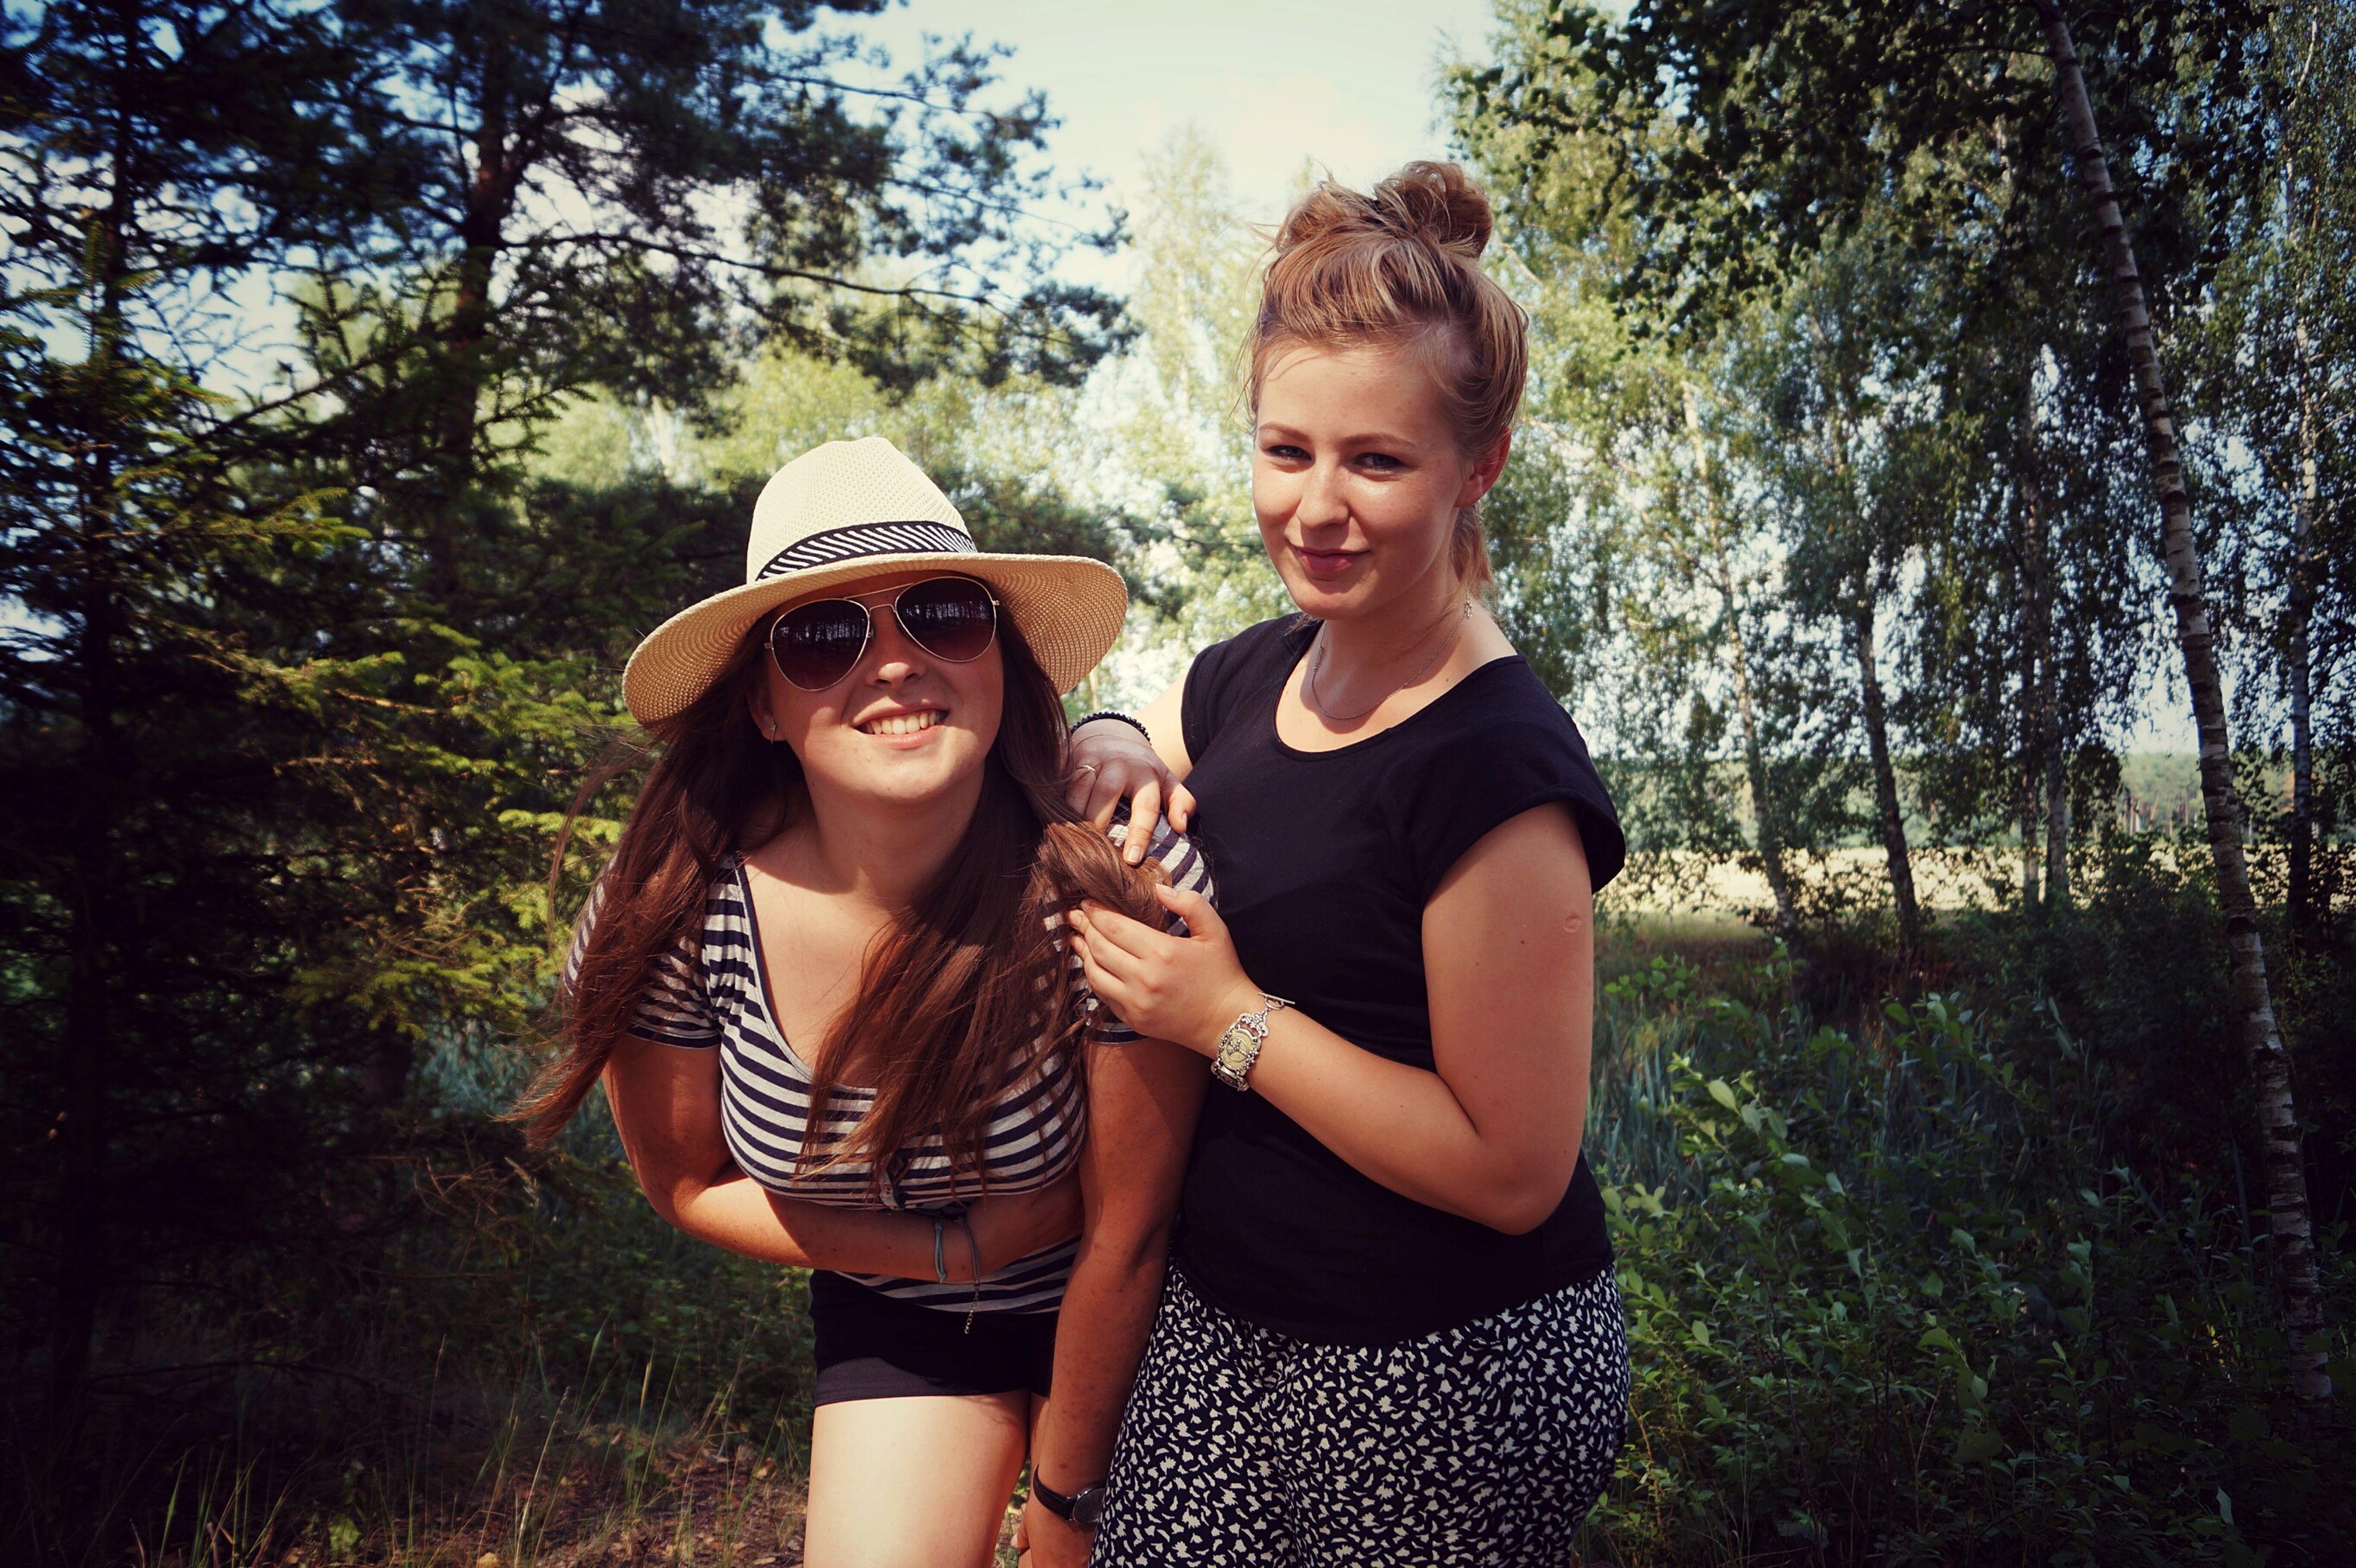 With Karolina (Caroline) Bestfriend Polishgirls Summer2015 Meeting Friends 😊👩👩☀